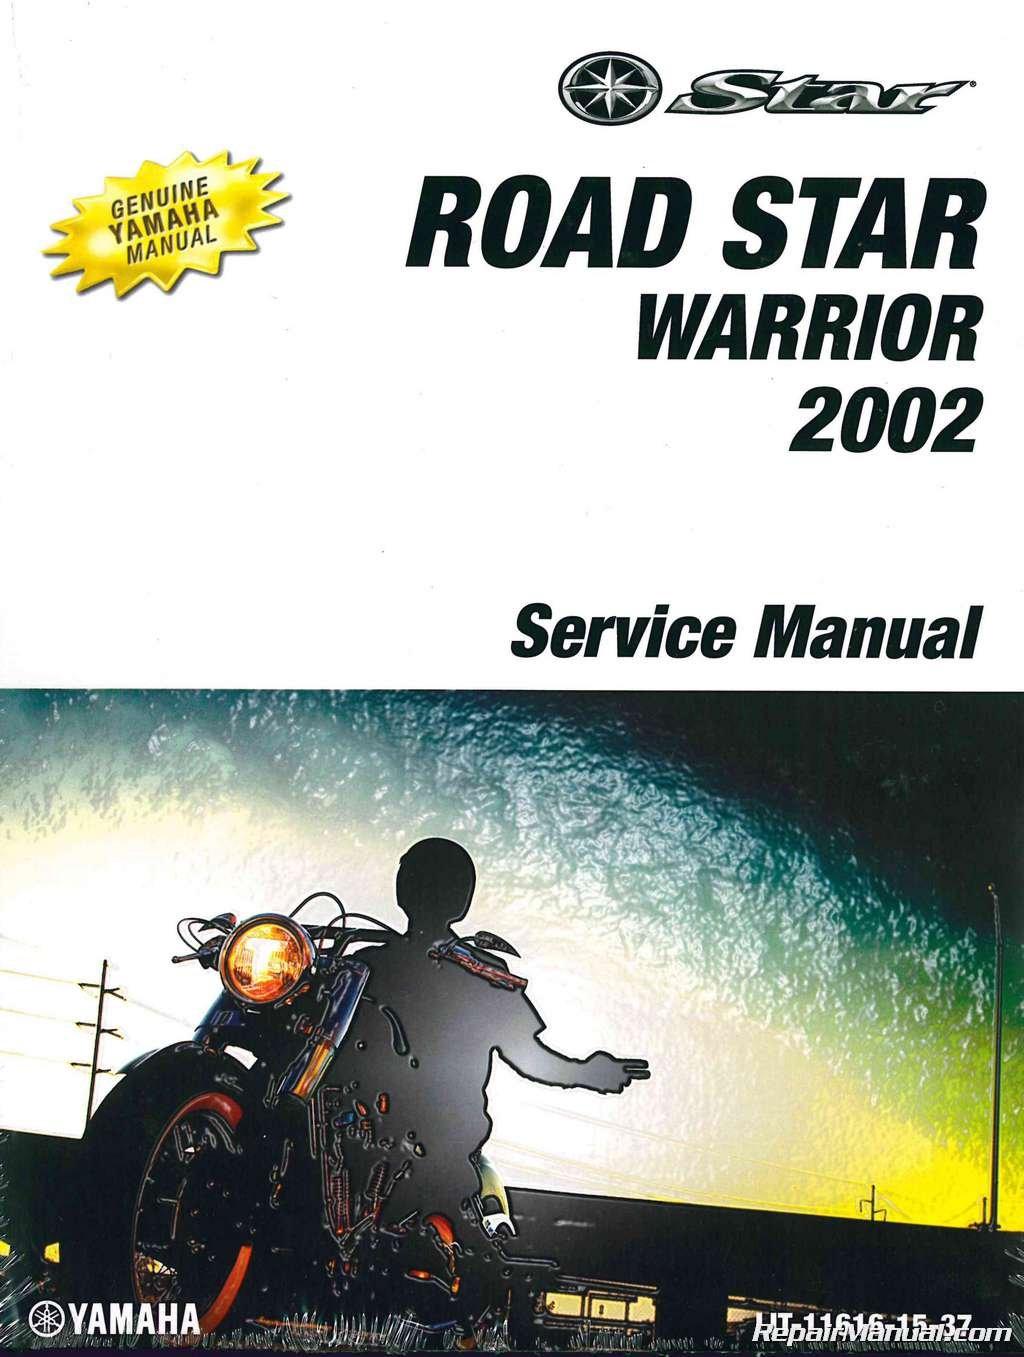 Download LIT-11616-15-37 2002 Yamaha Road Star Warrior 1700 Motorcycle Service Manual pdf